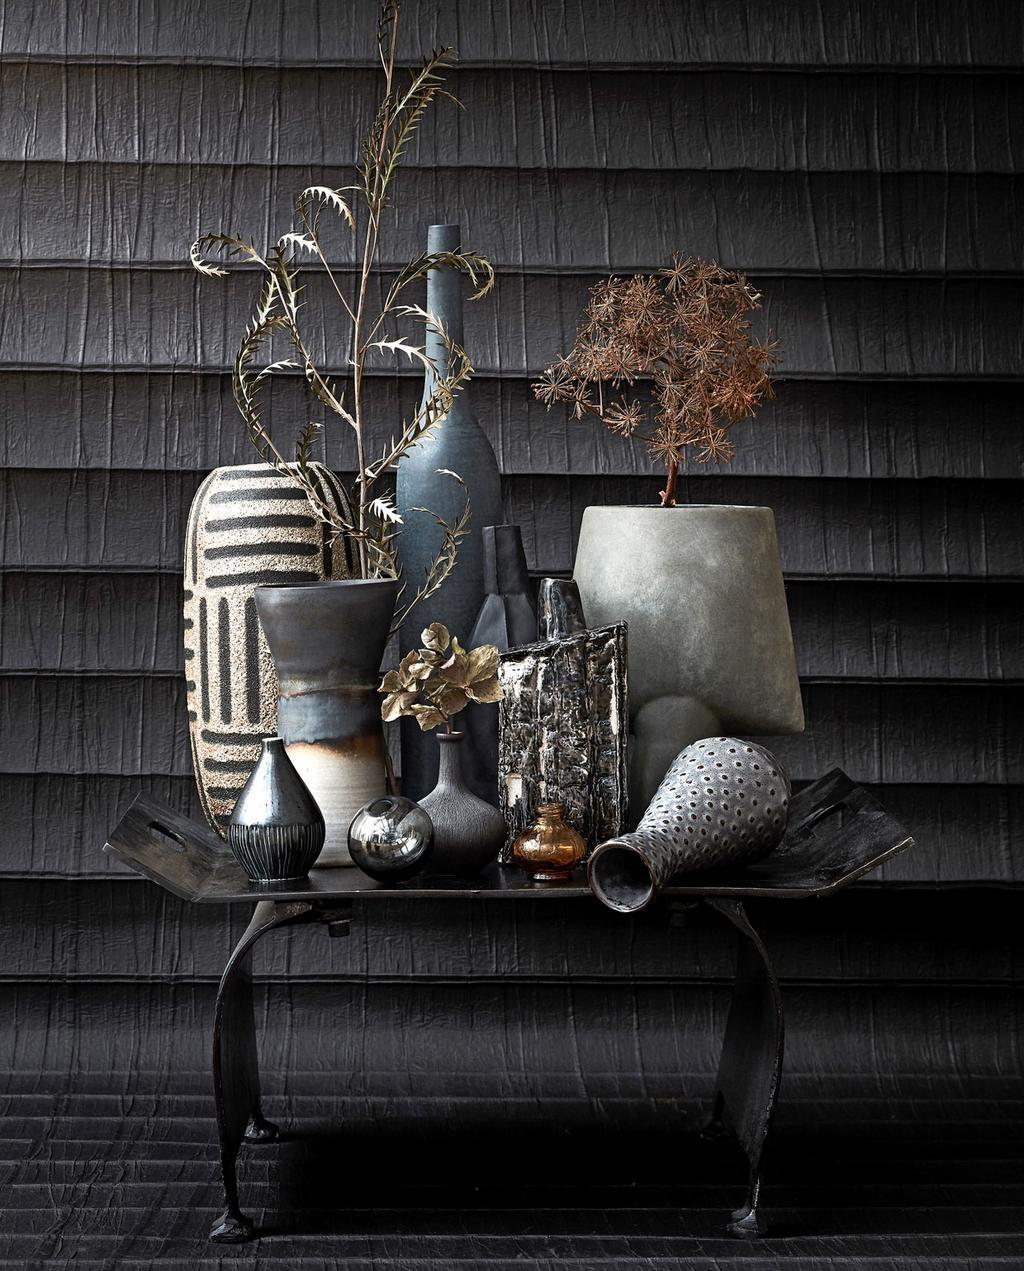 vtwonen 10-2019 | styling vazen donkere tinten op bijzettafel